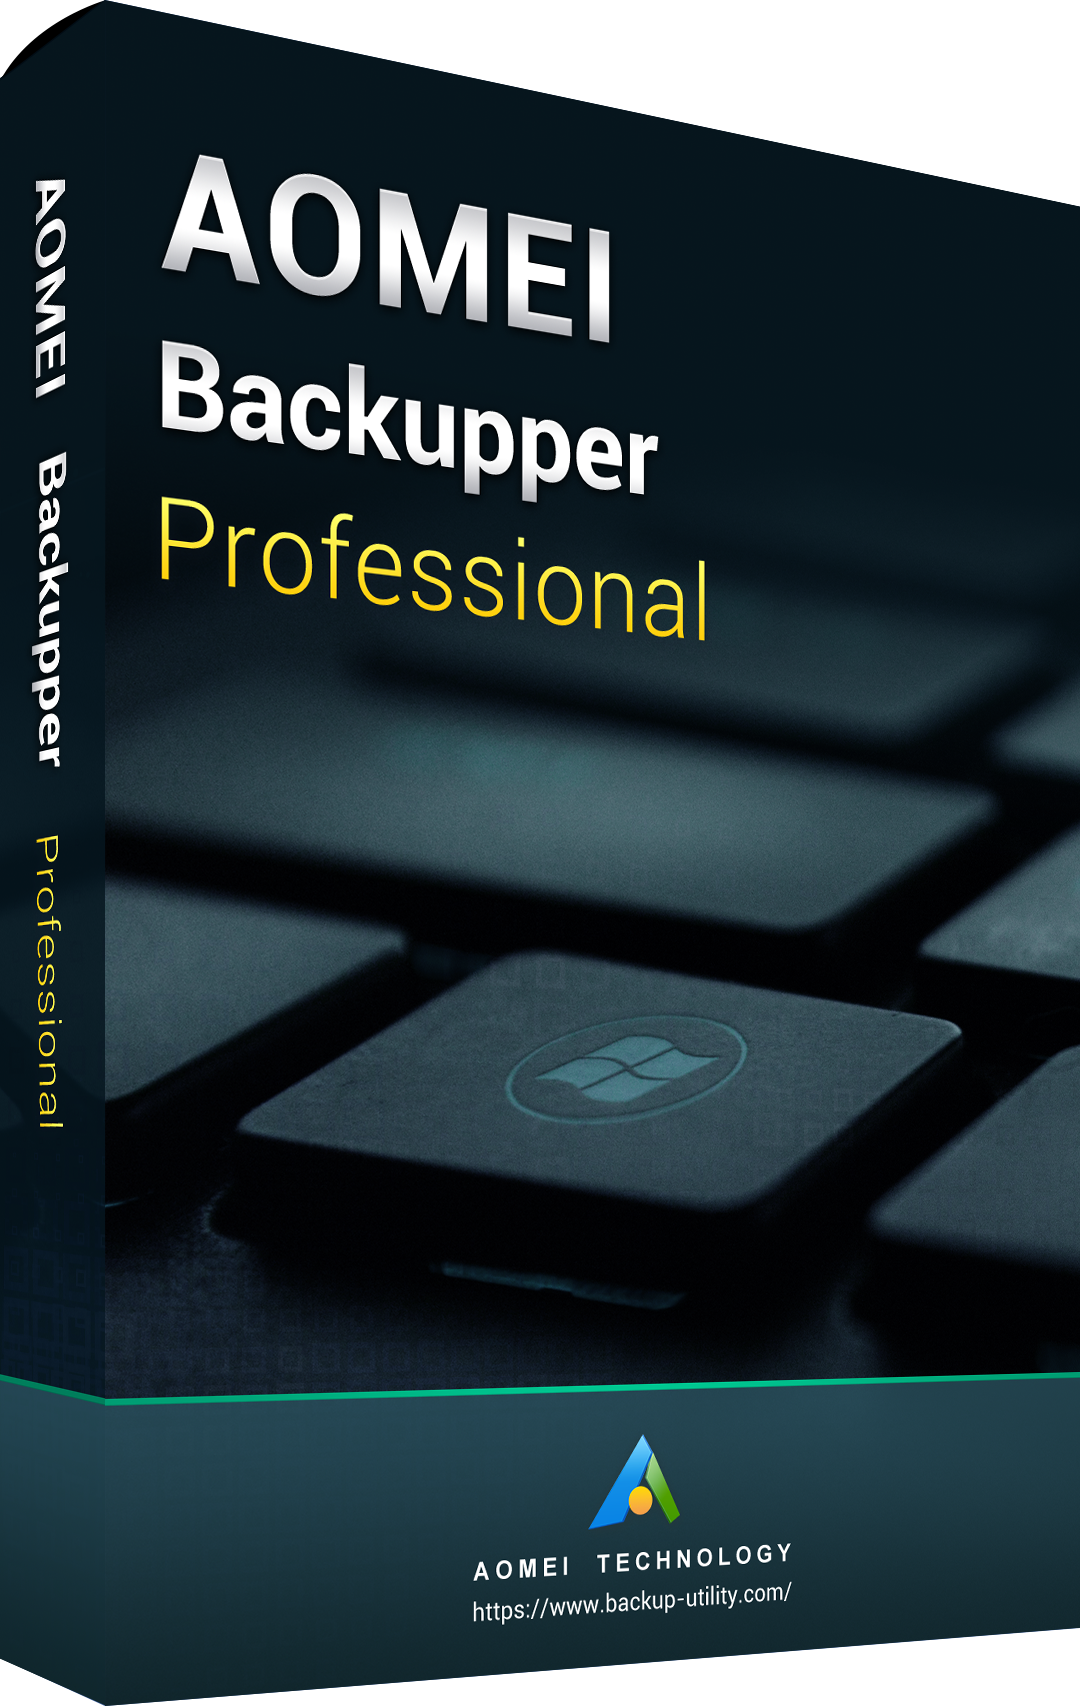 AOMEI Backupper Professional 5.7 Edition Key Global